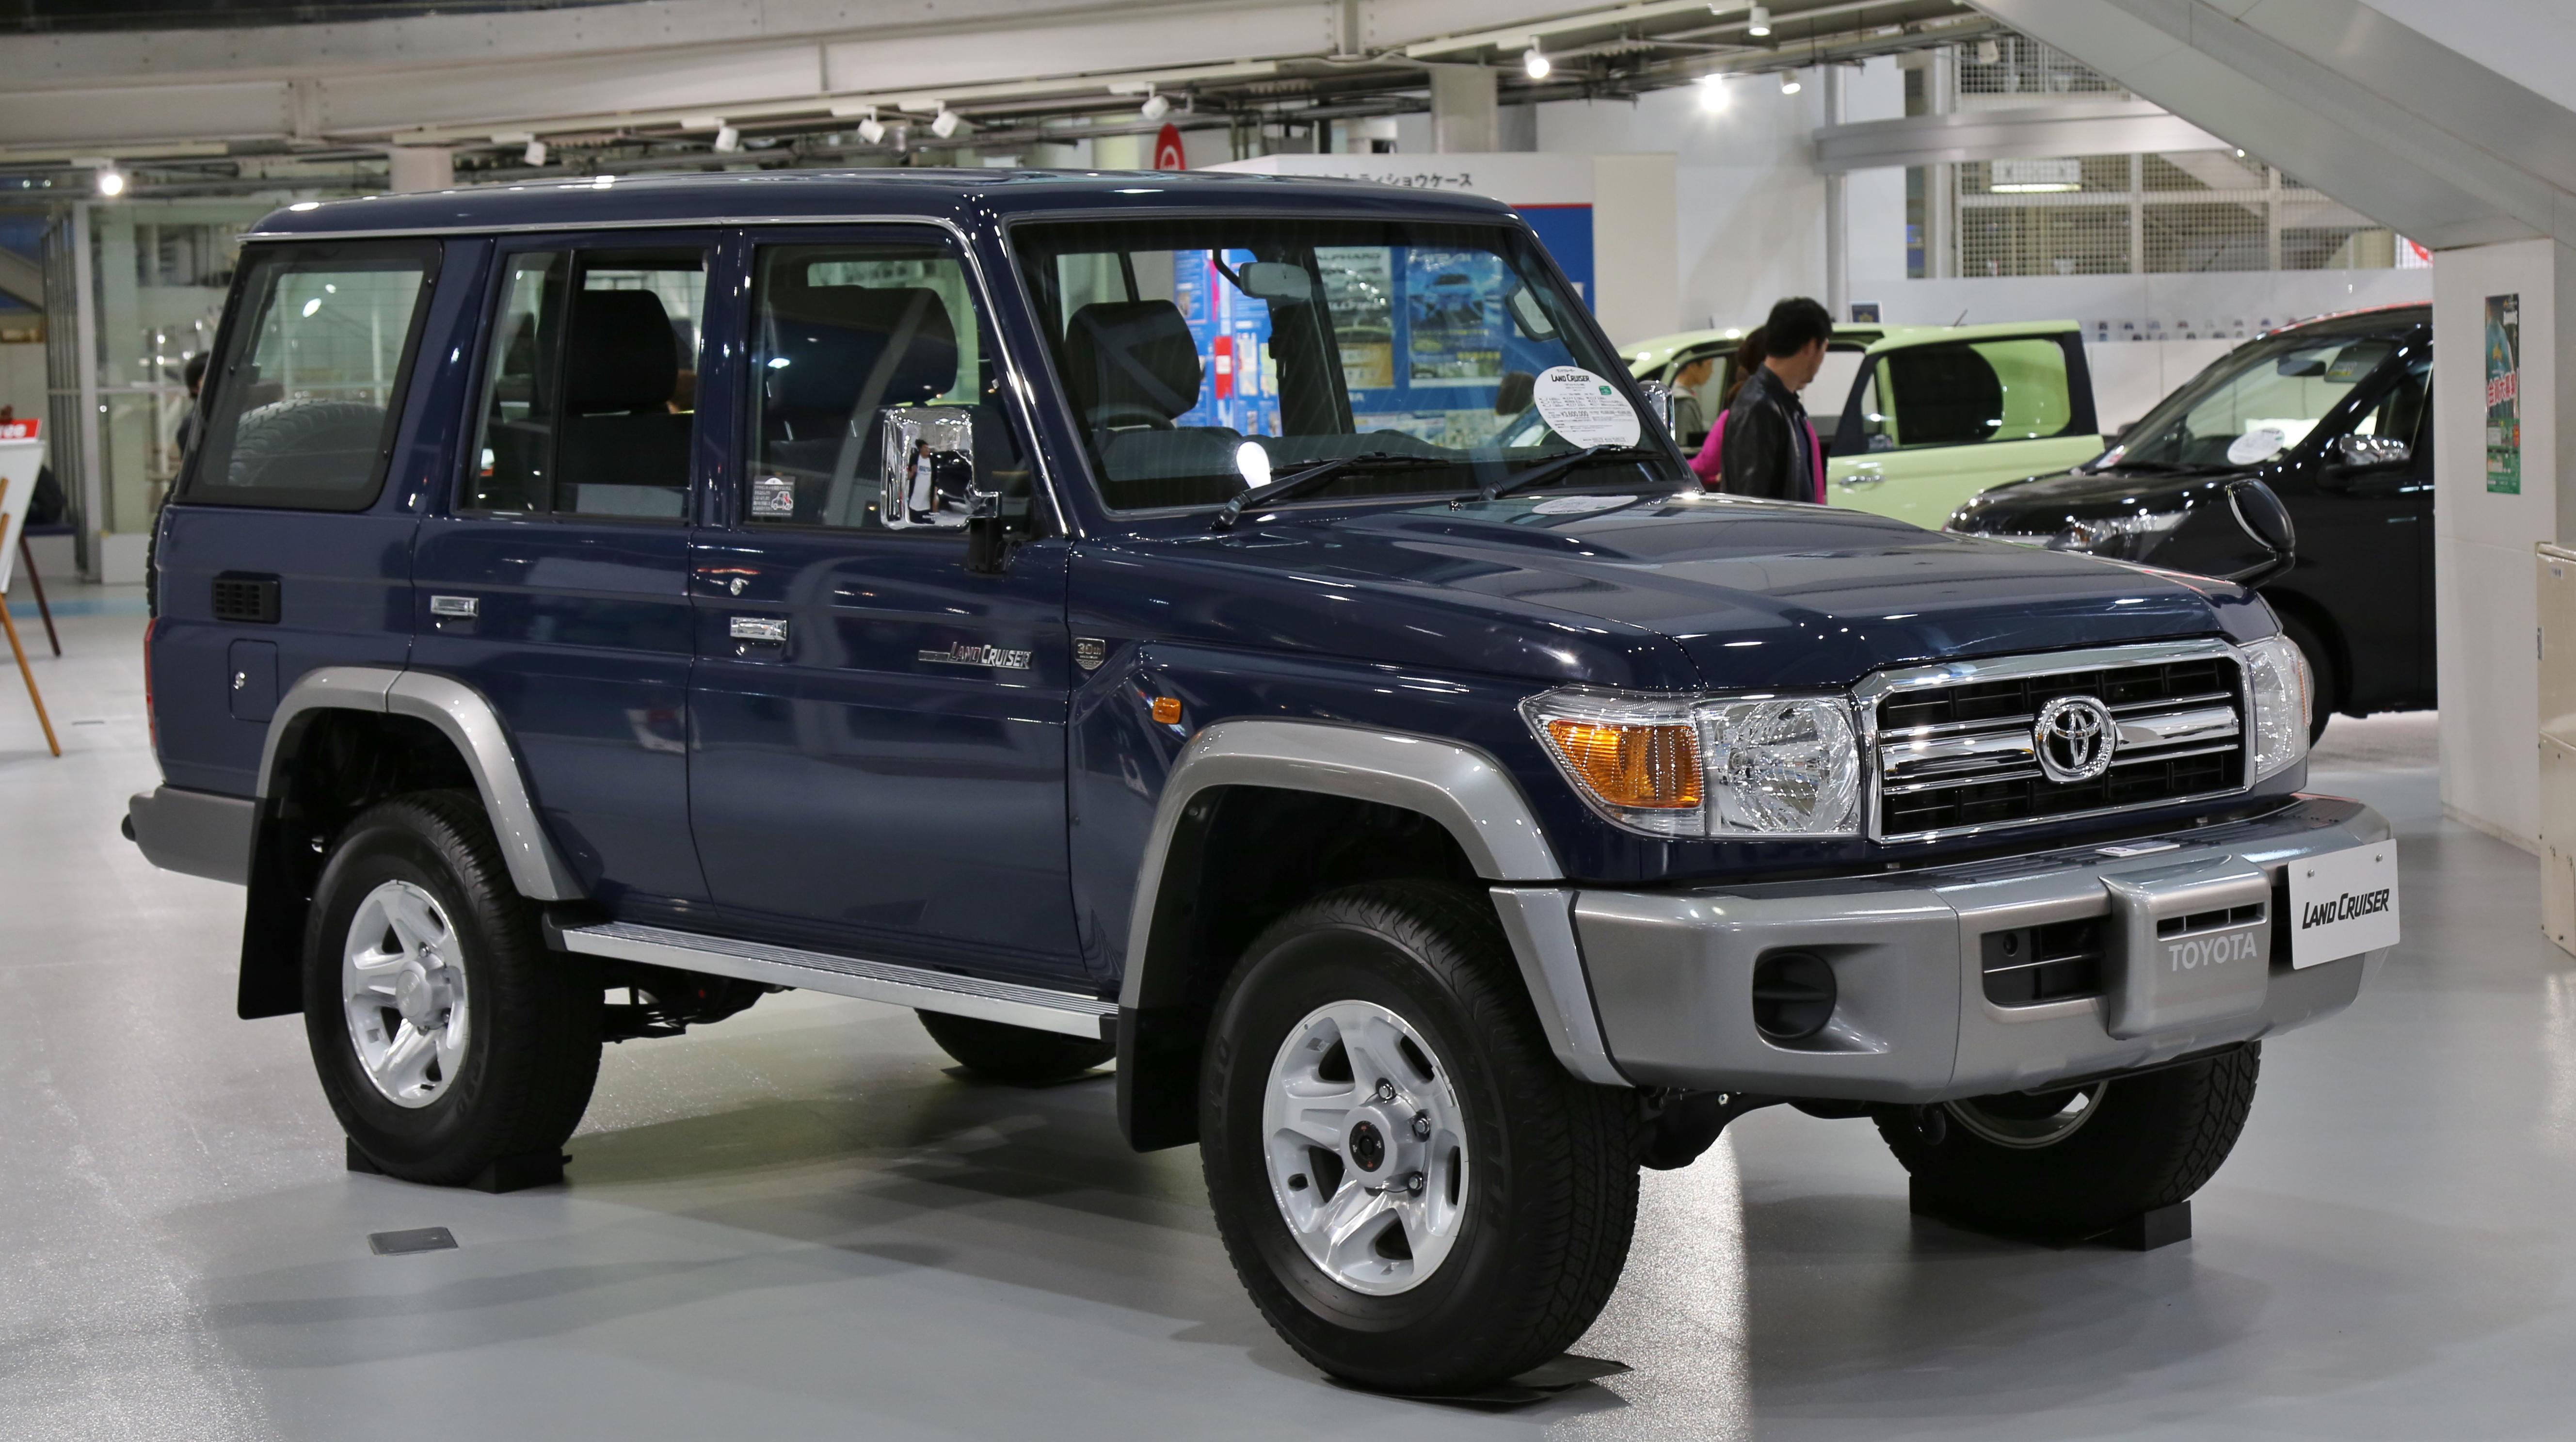 Toyota Land Cruiser 70 Modified | www.pixshark.com ...